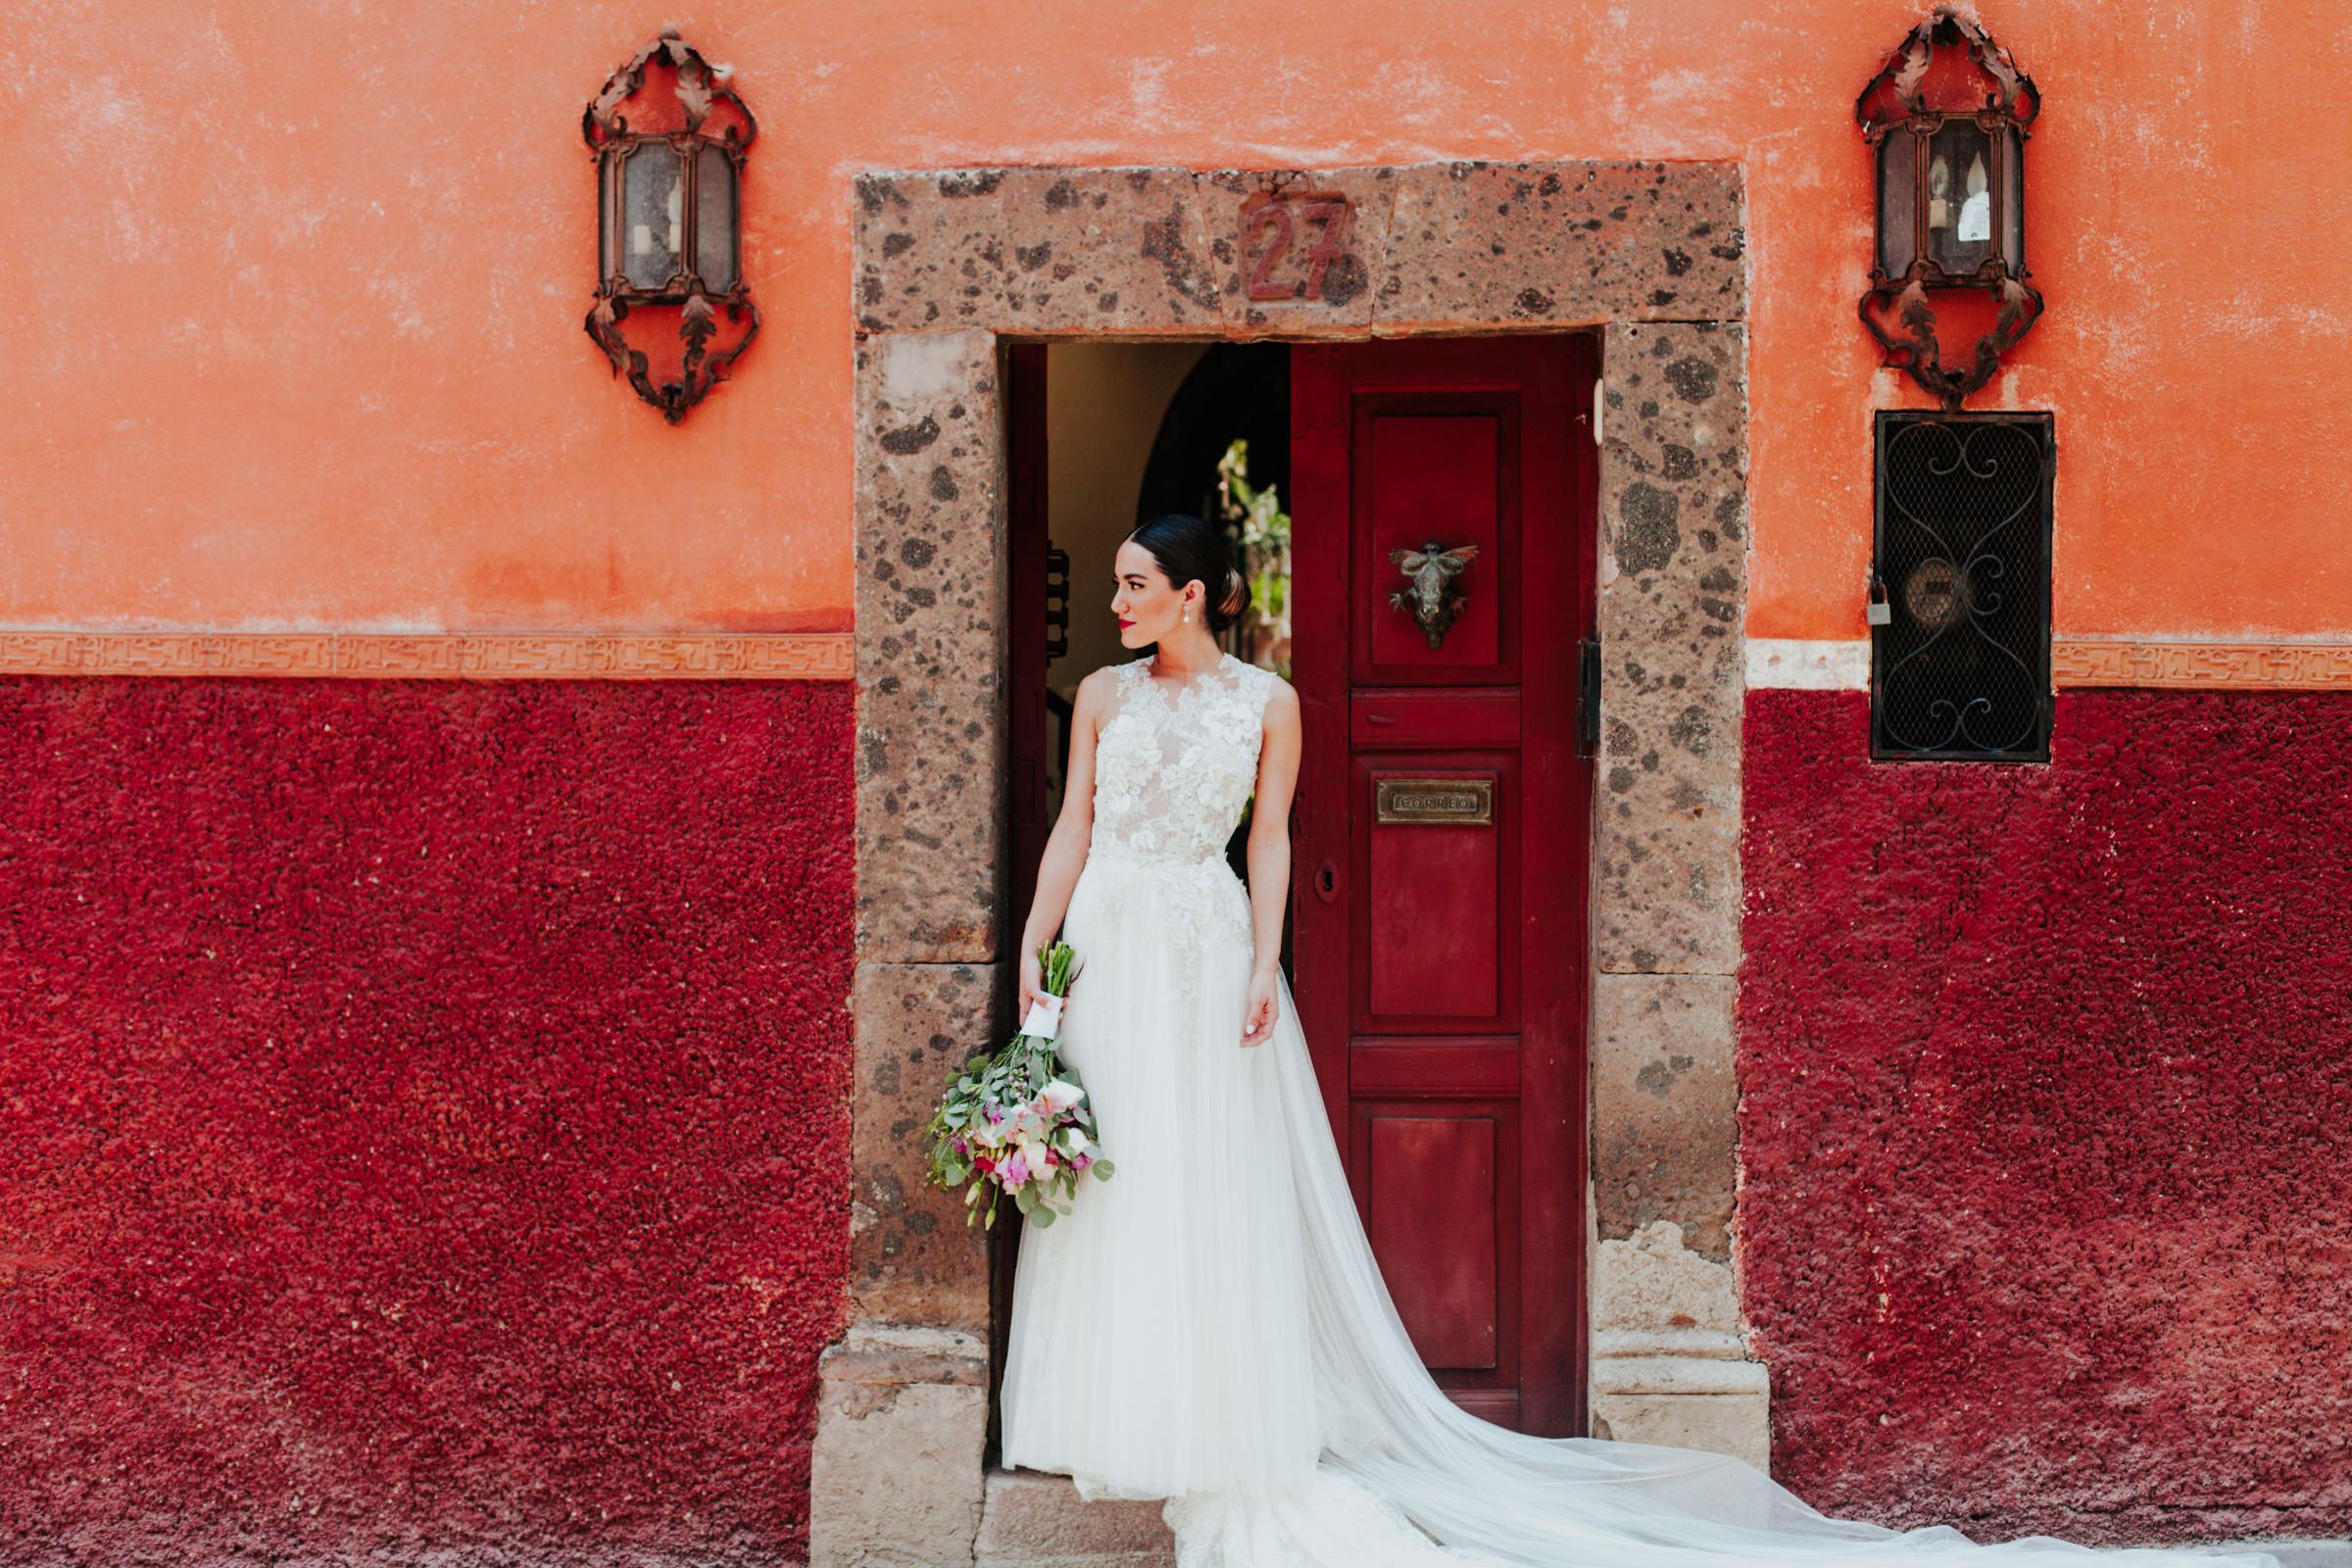 San-Miguel-de-Allende-Wedding-Photography-Parroquia-Instituto-Boda-Fotografia-Fer-Sergio-Pierce-Lifestyle-Photography0210.JPG